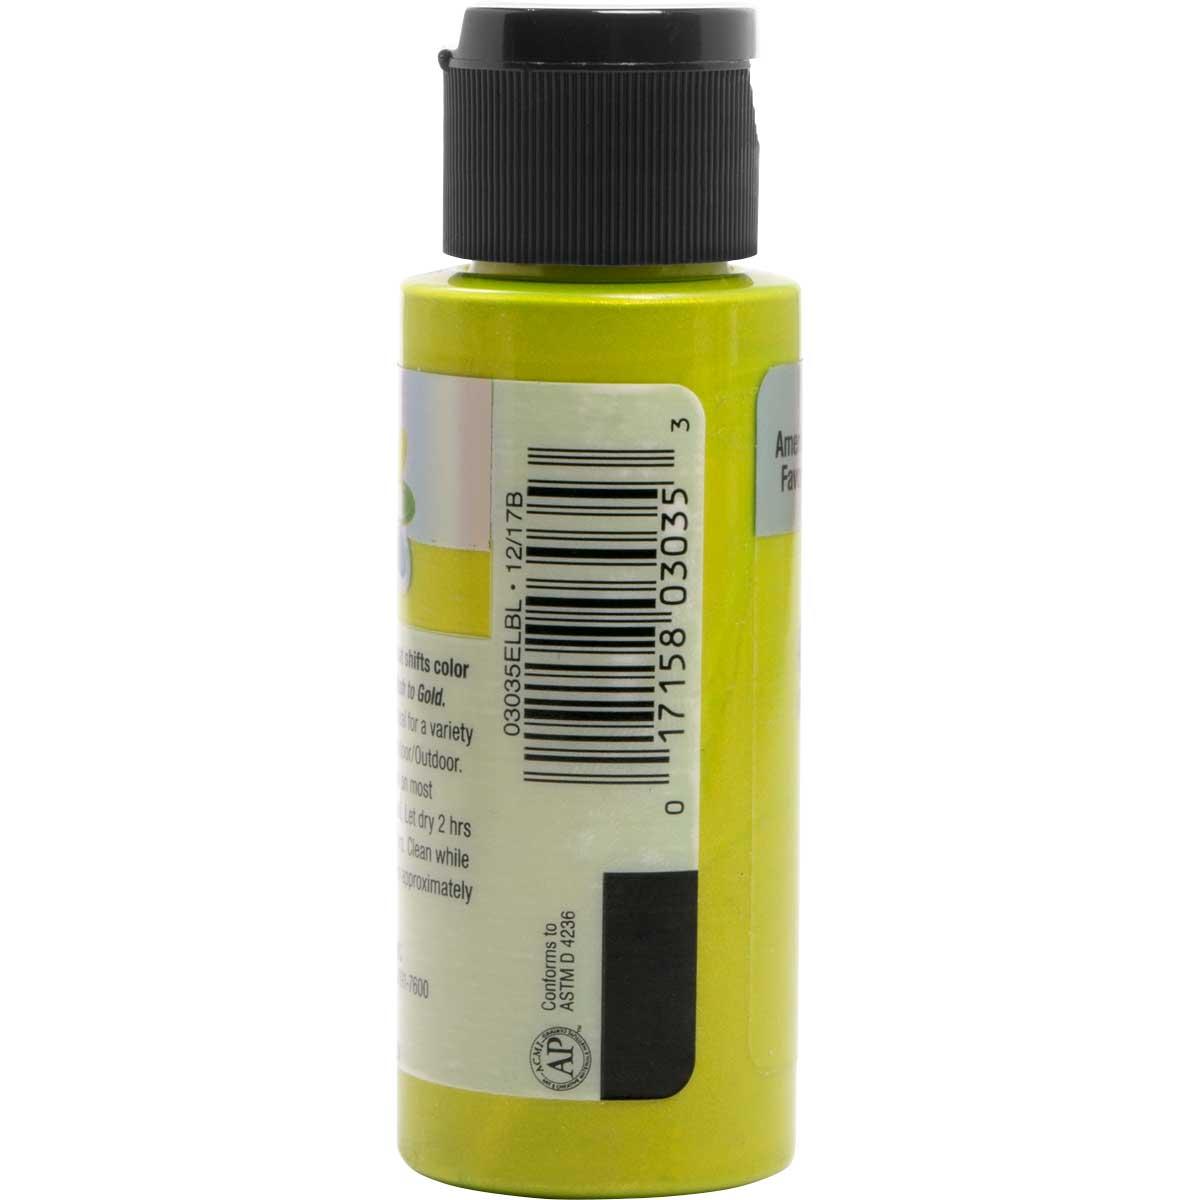 Delta Ceramcoat ® Acrylic Paint - Flash Metallic Green, 2 oz. - 03035